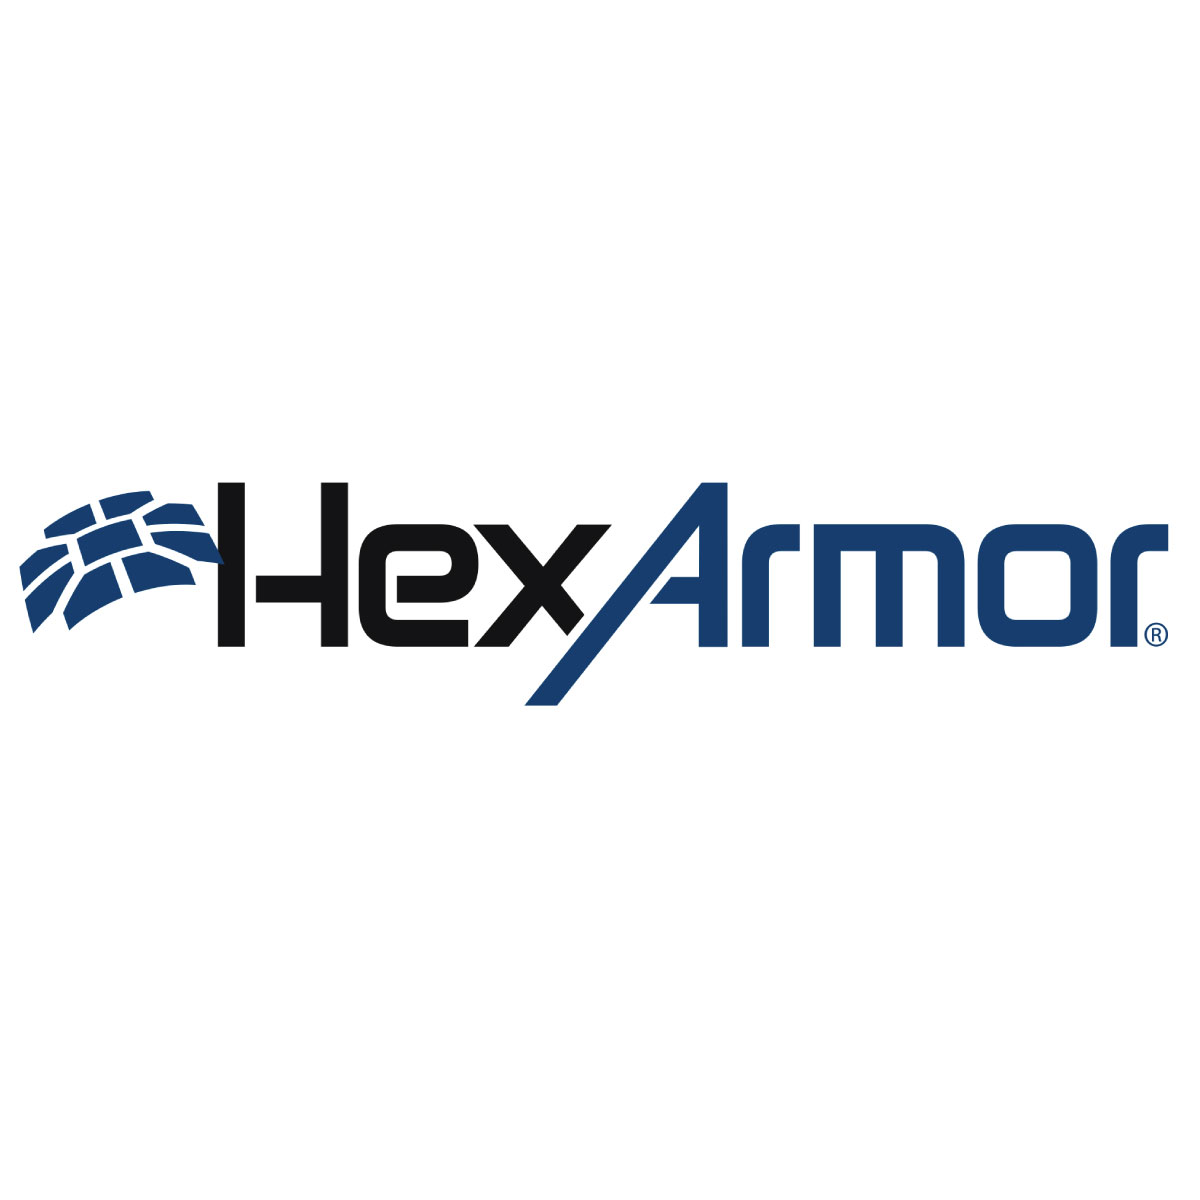 Hex armor logo